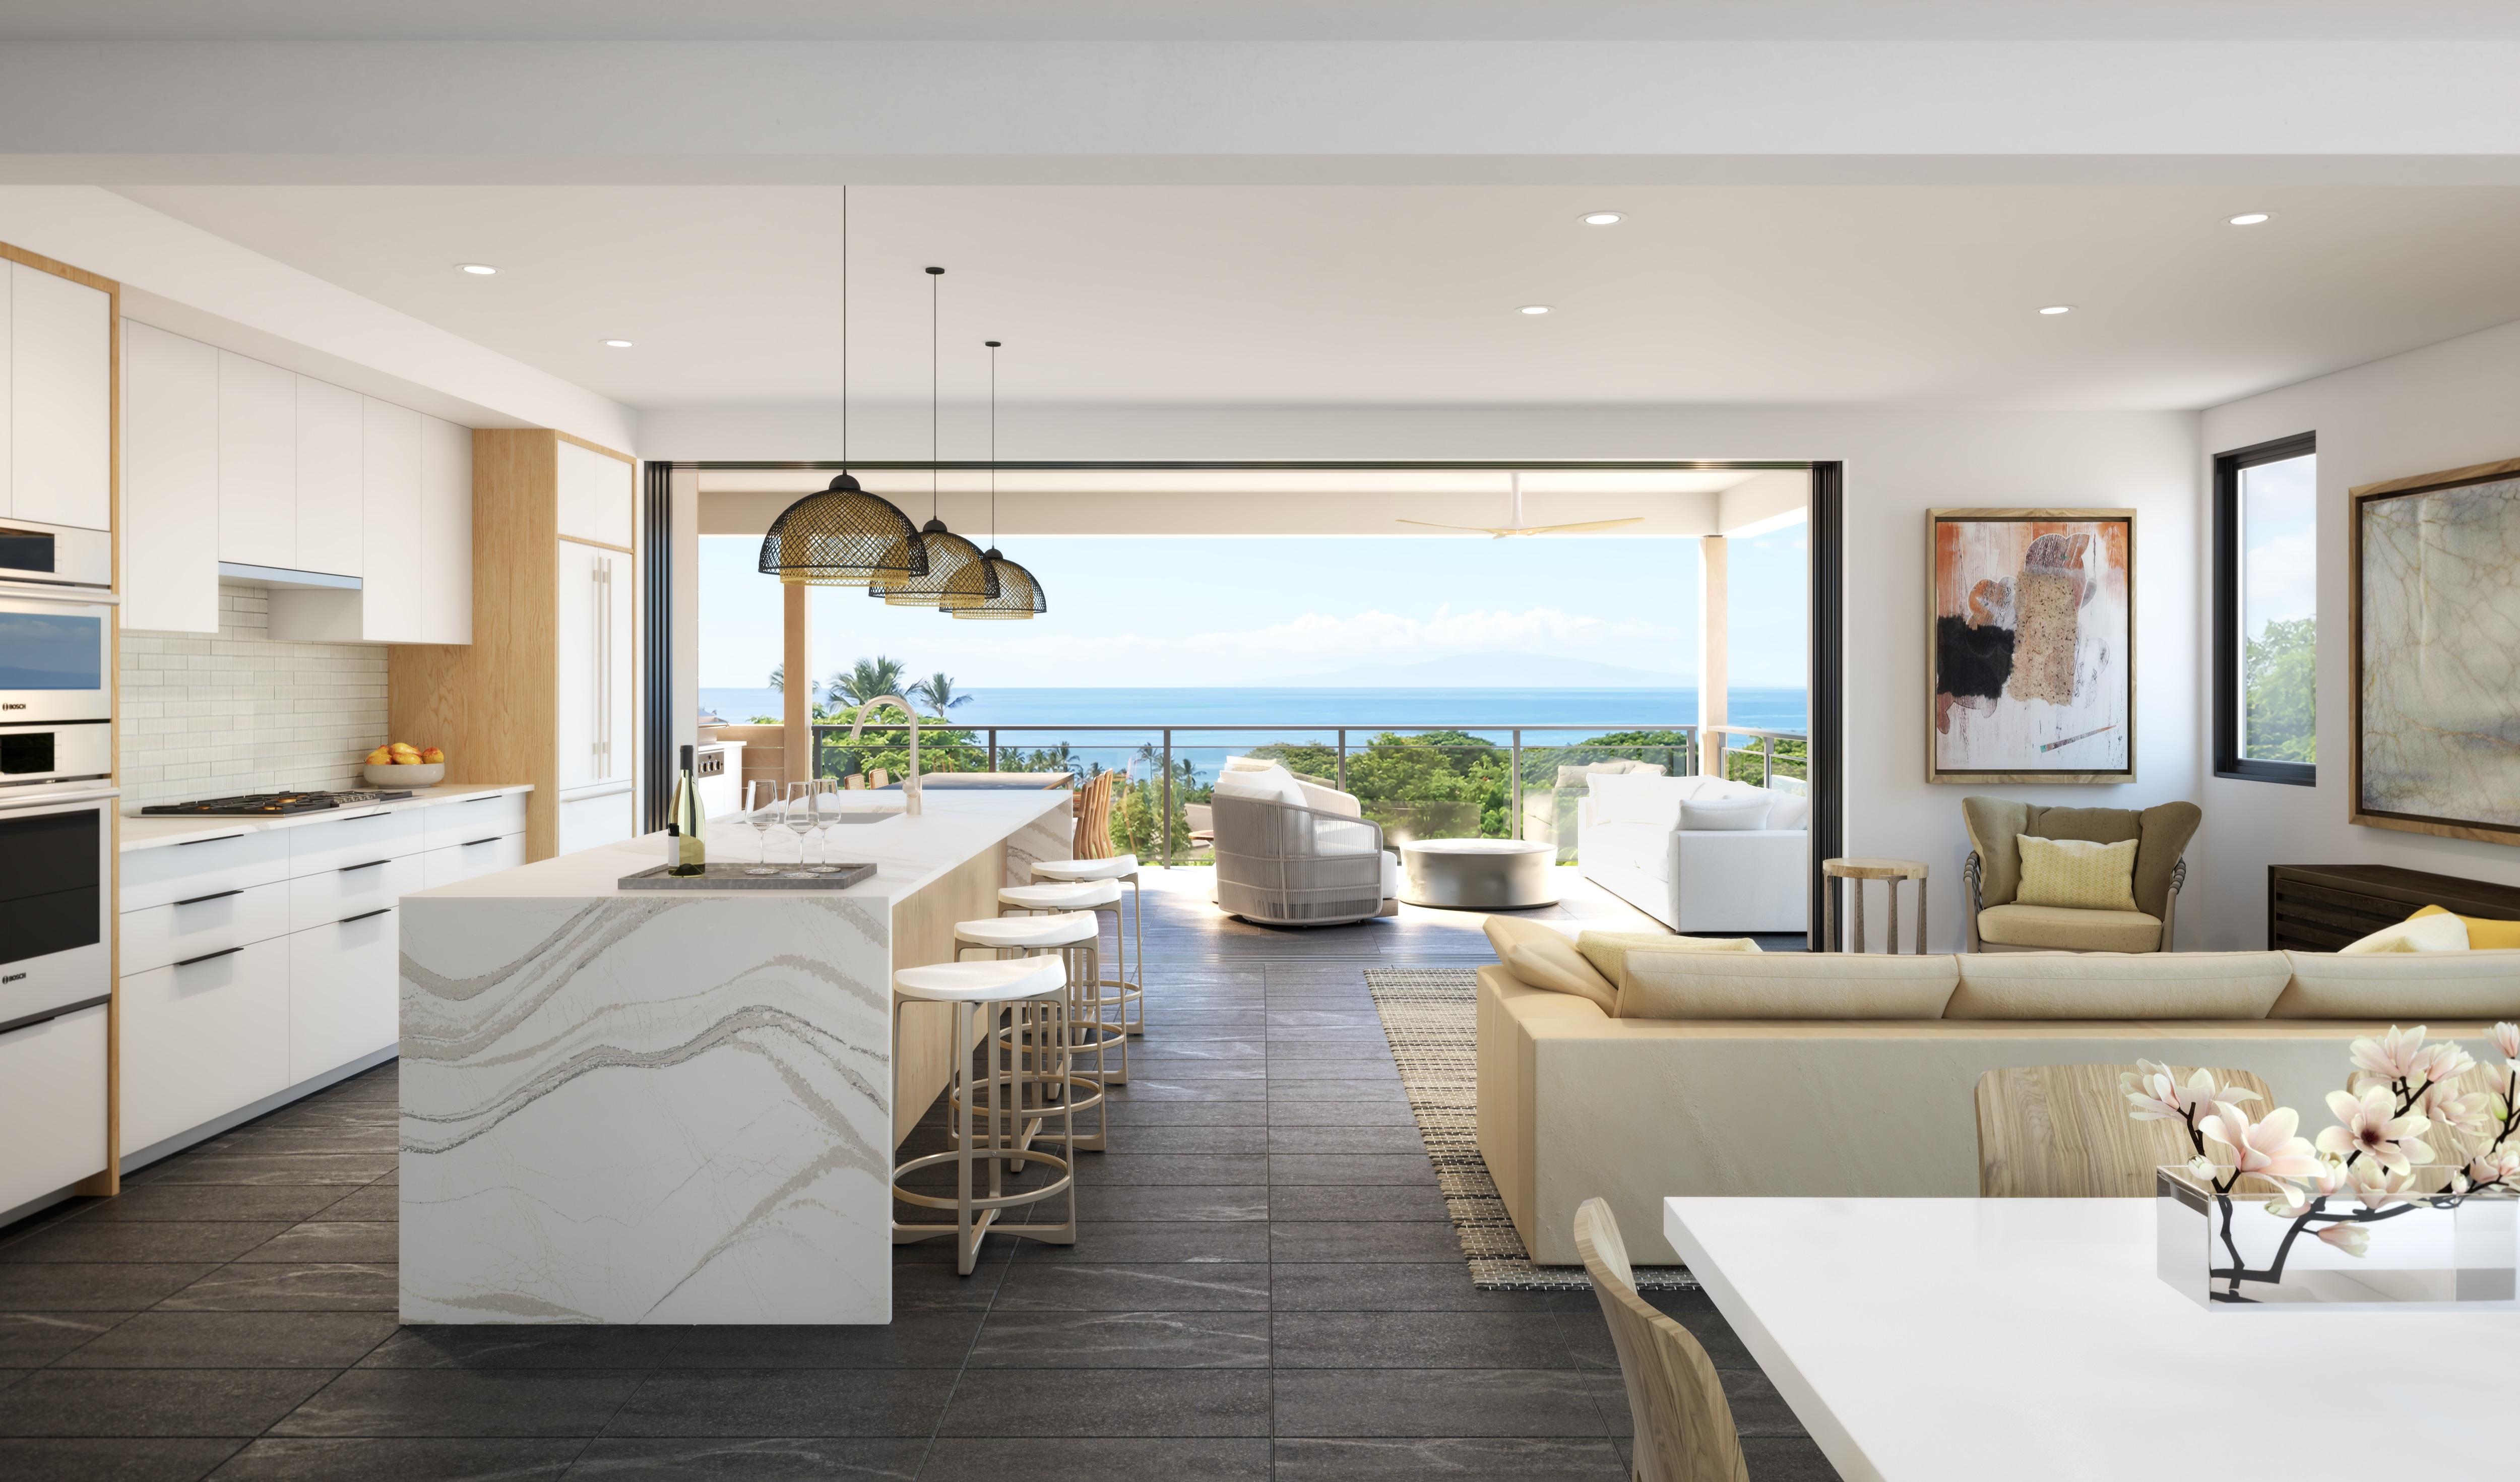 Plans for New Luxury Residential Development in Wailea